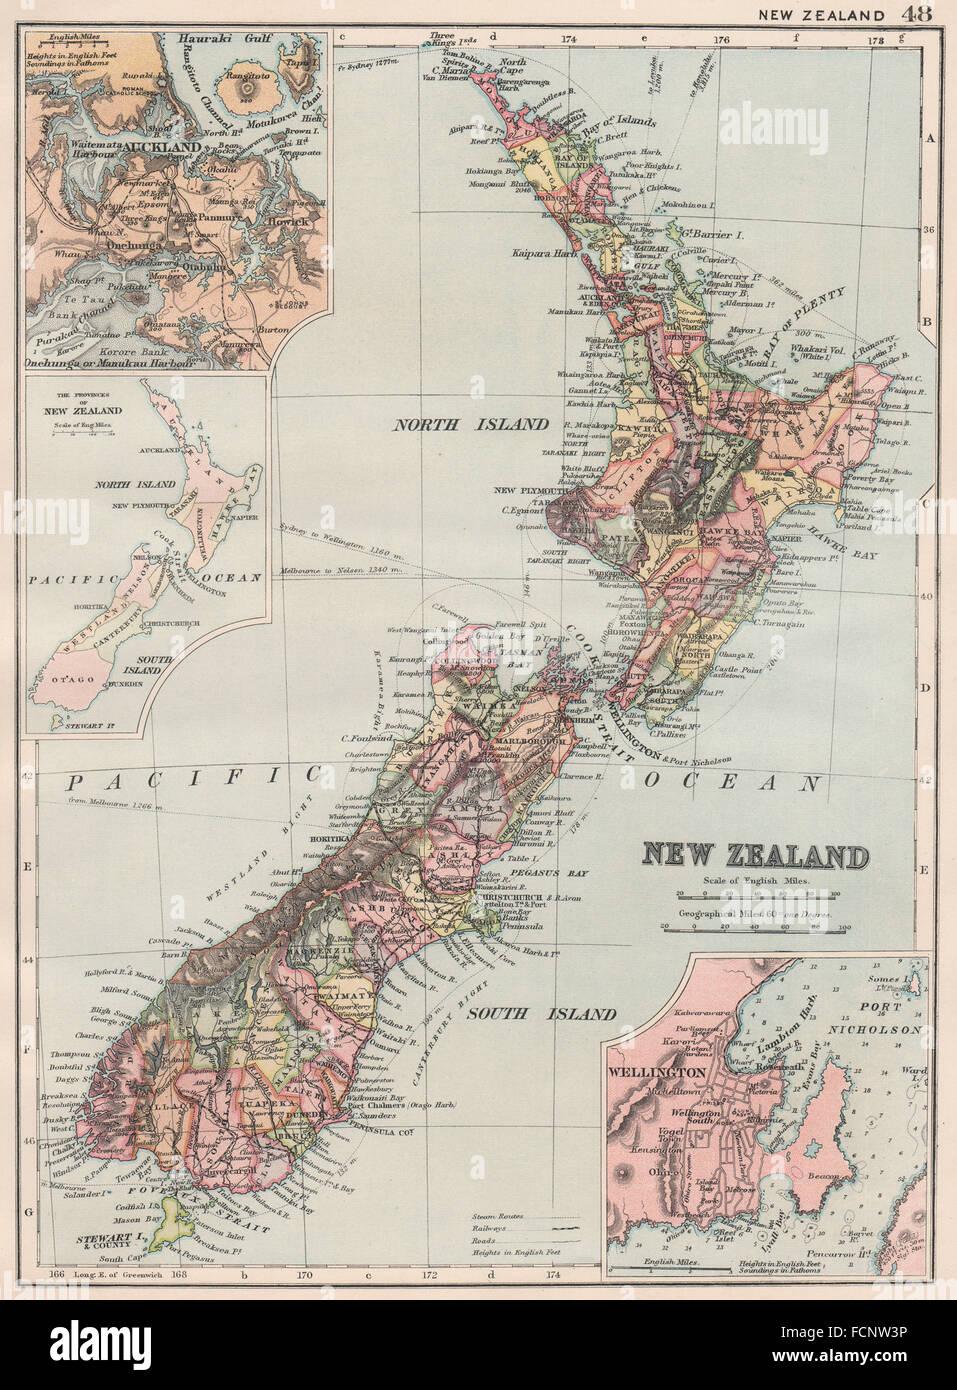 New Zealand Provinces Map.New Zealand Counties Wellington Auckland Nz Provinces Bacon